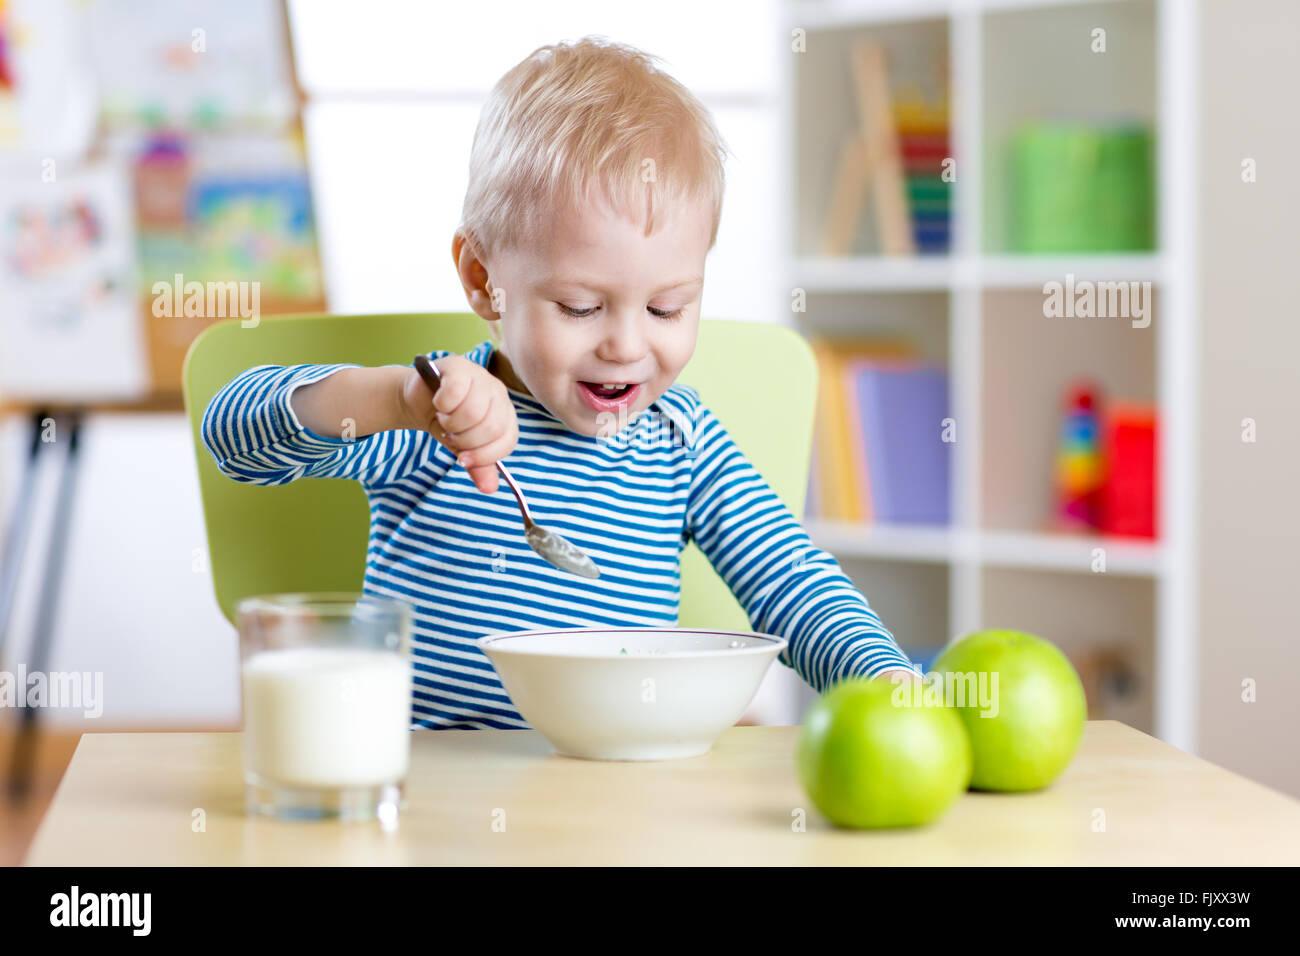 kid eating healthy food at home or kindergarten - Stock Image